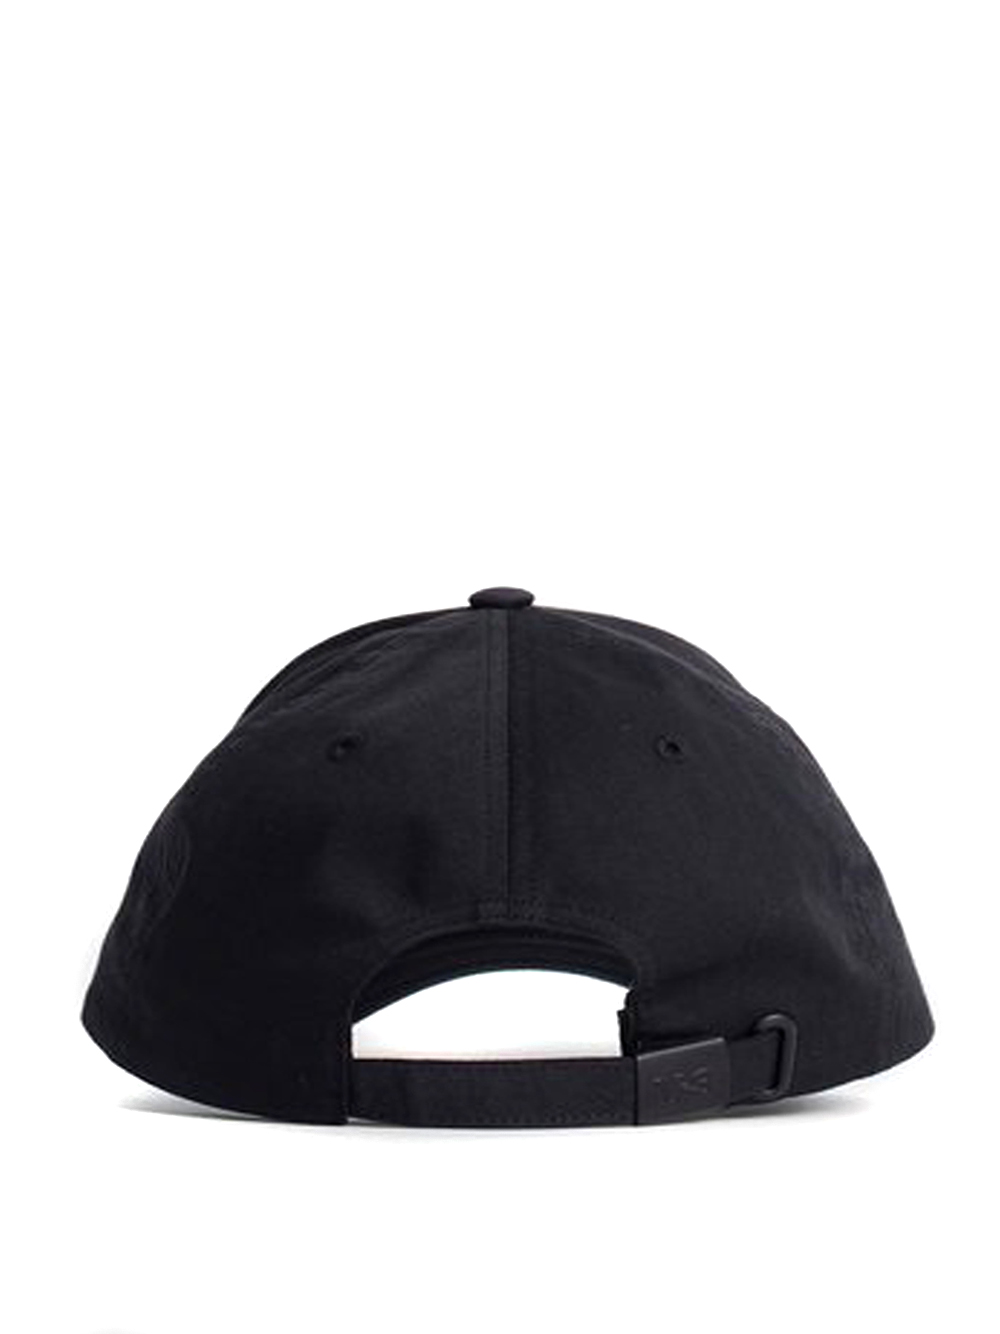 logo hat man black in cotton Y-3 | Hats | HA6530BLACK